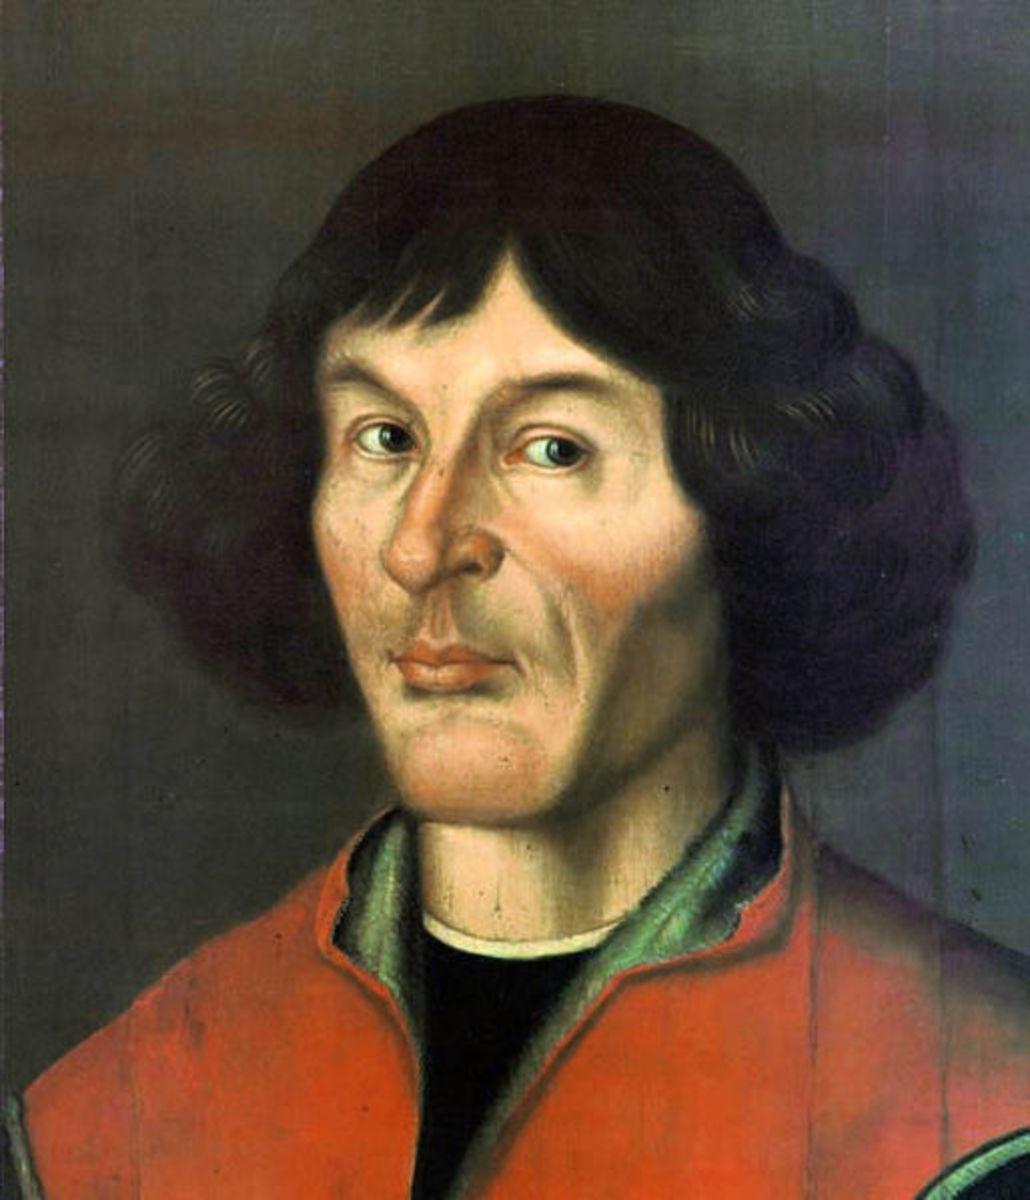 Nicolaus Copernicus, or Nikolaur Kopernikus, proponent of the Heliocentric theory,